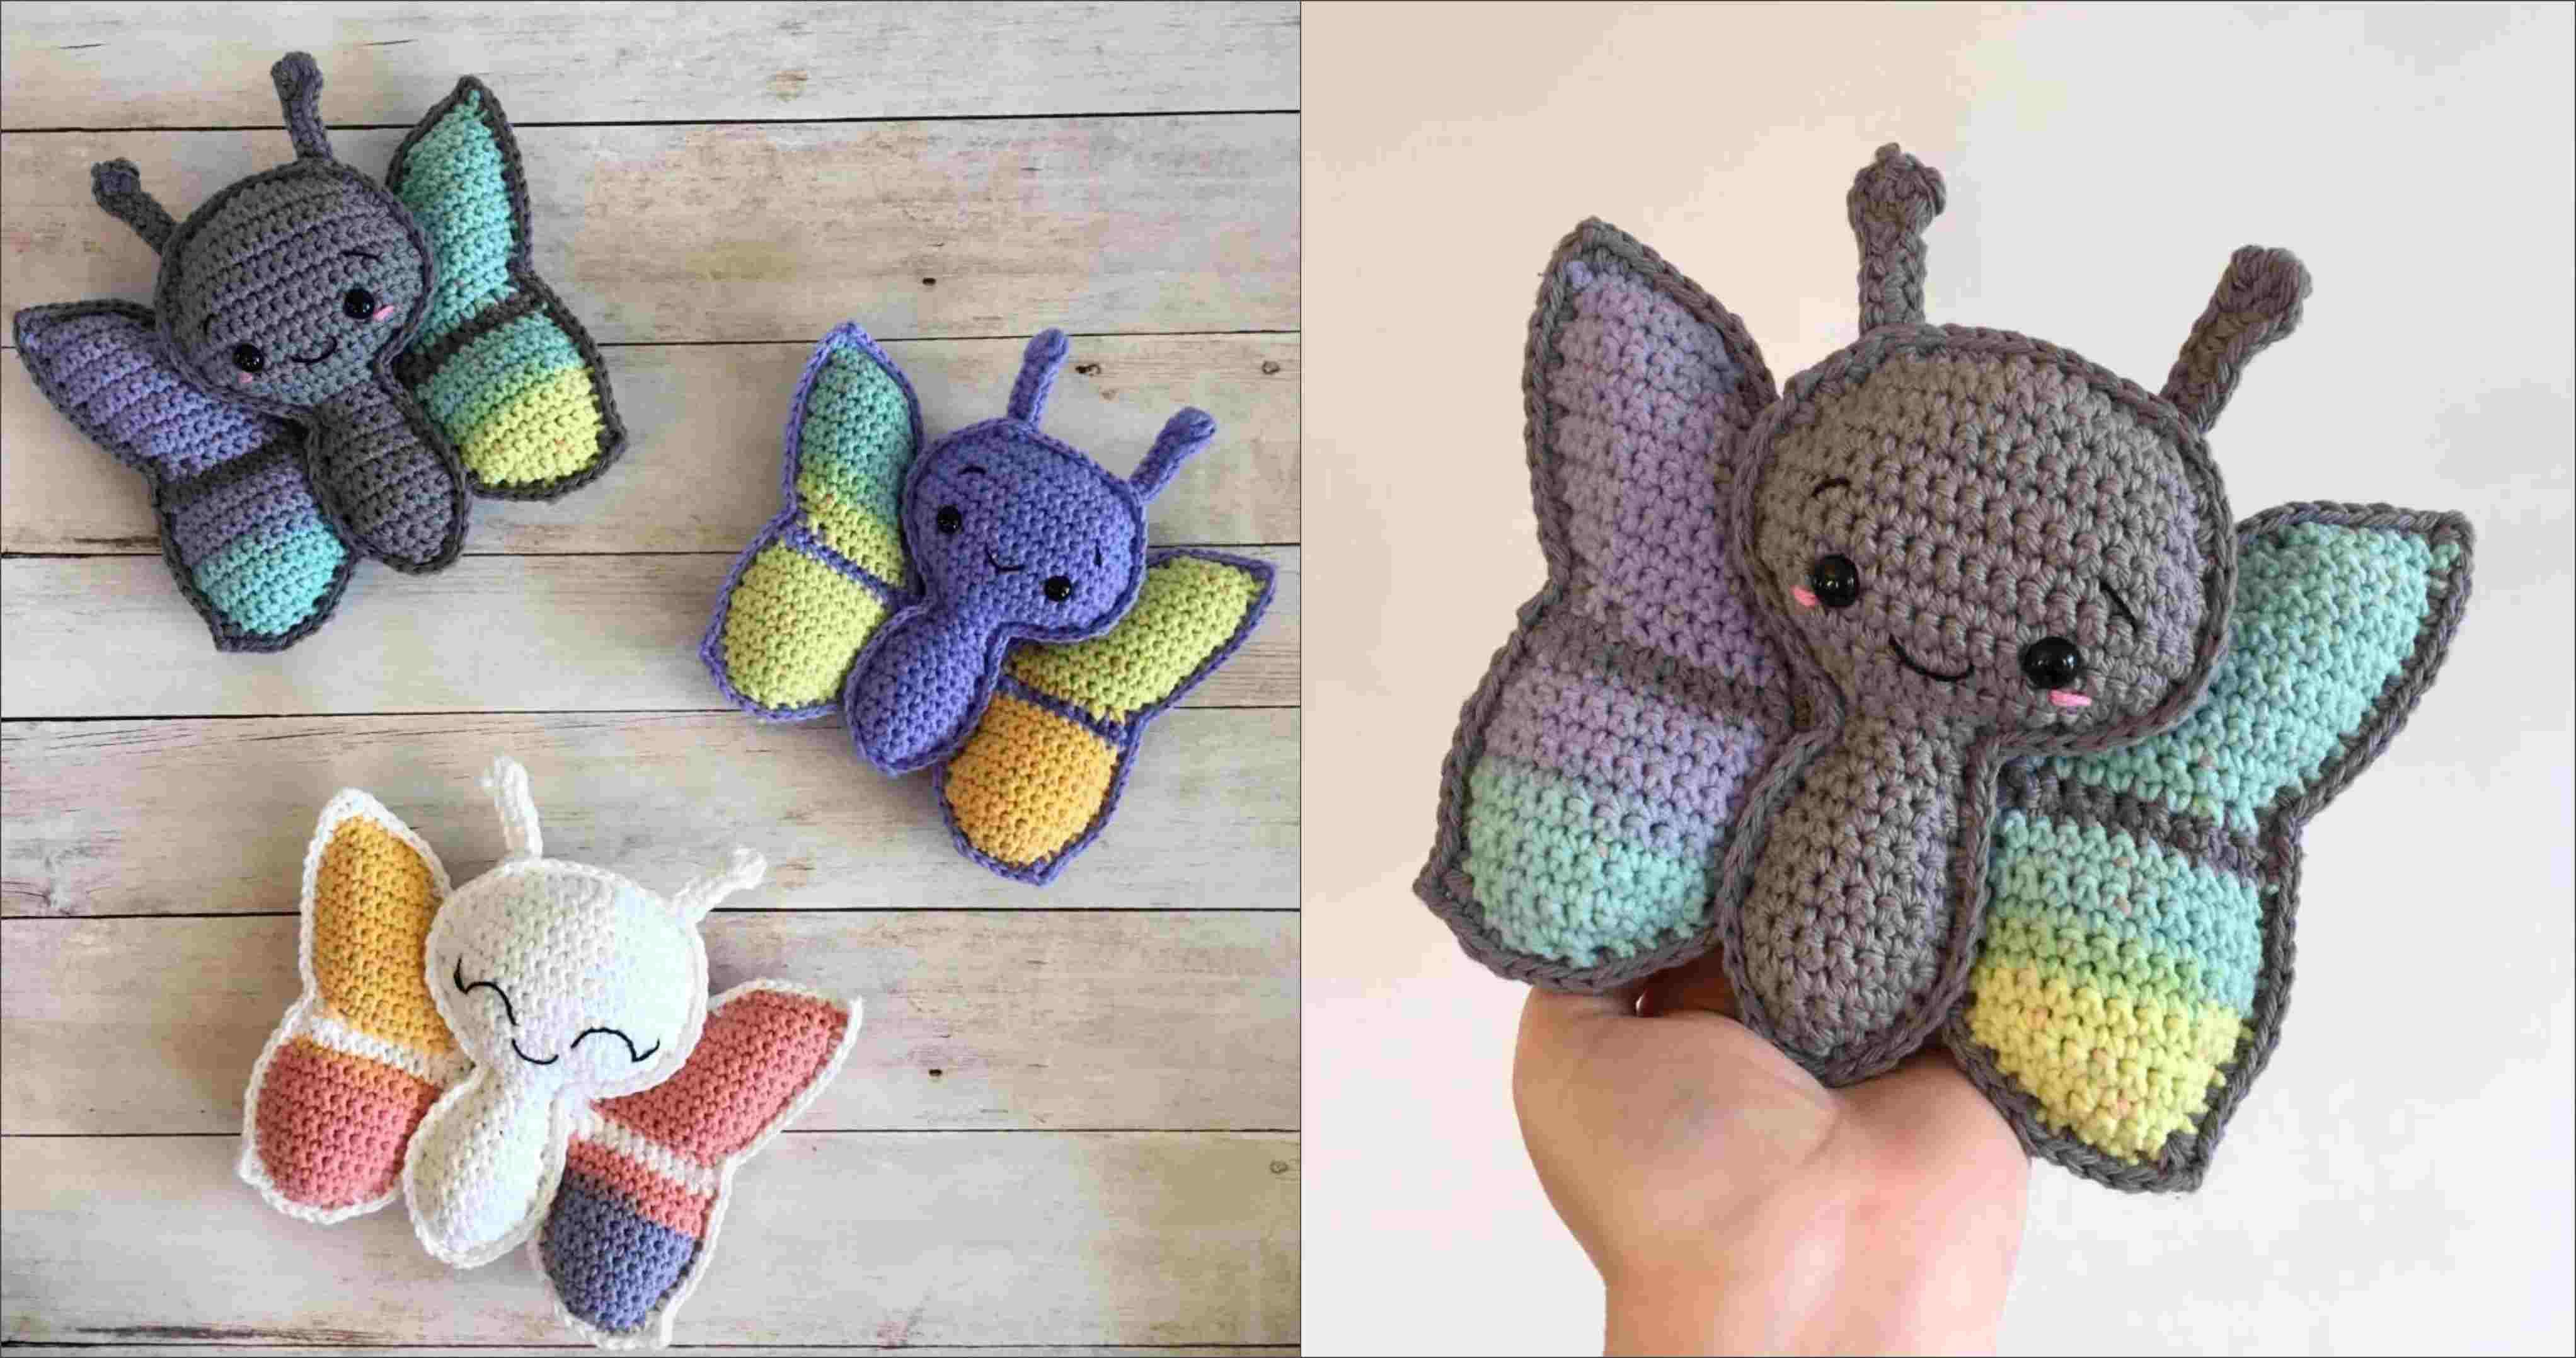 Best Amigurumi Crochet Patterns Toy Models - Amigurumi | Crochet ... | 2155x4088